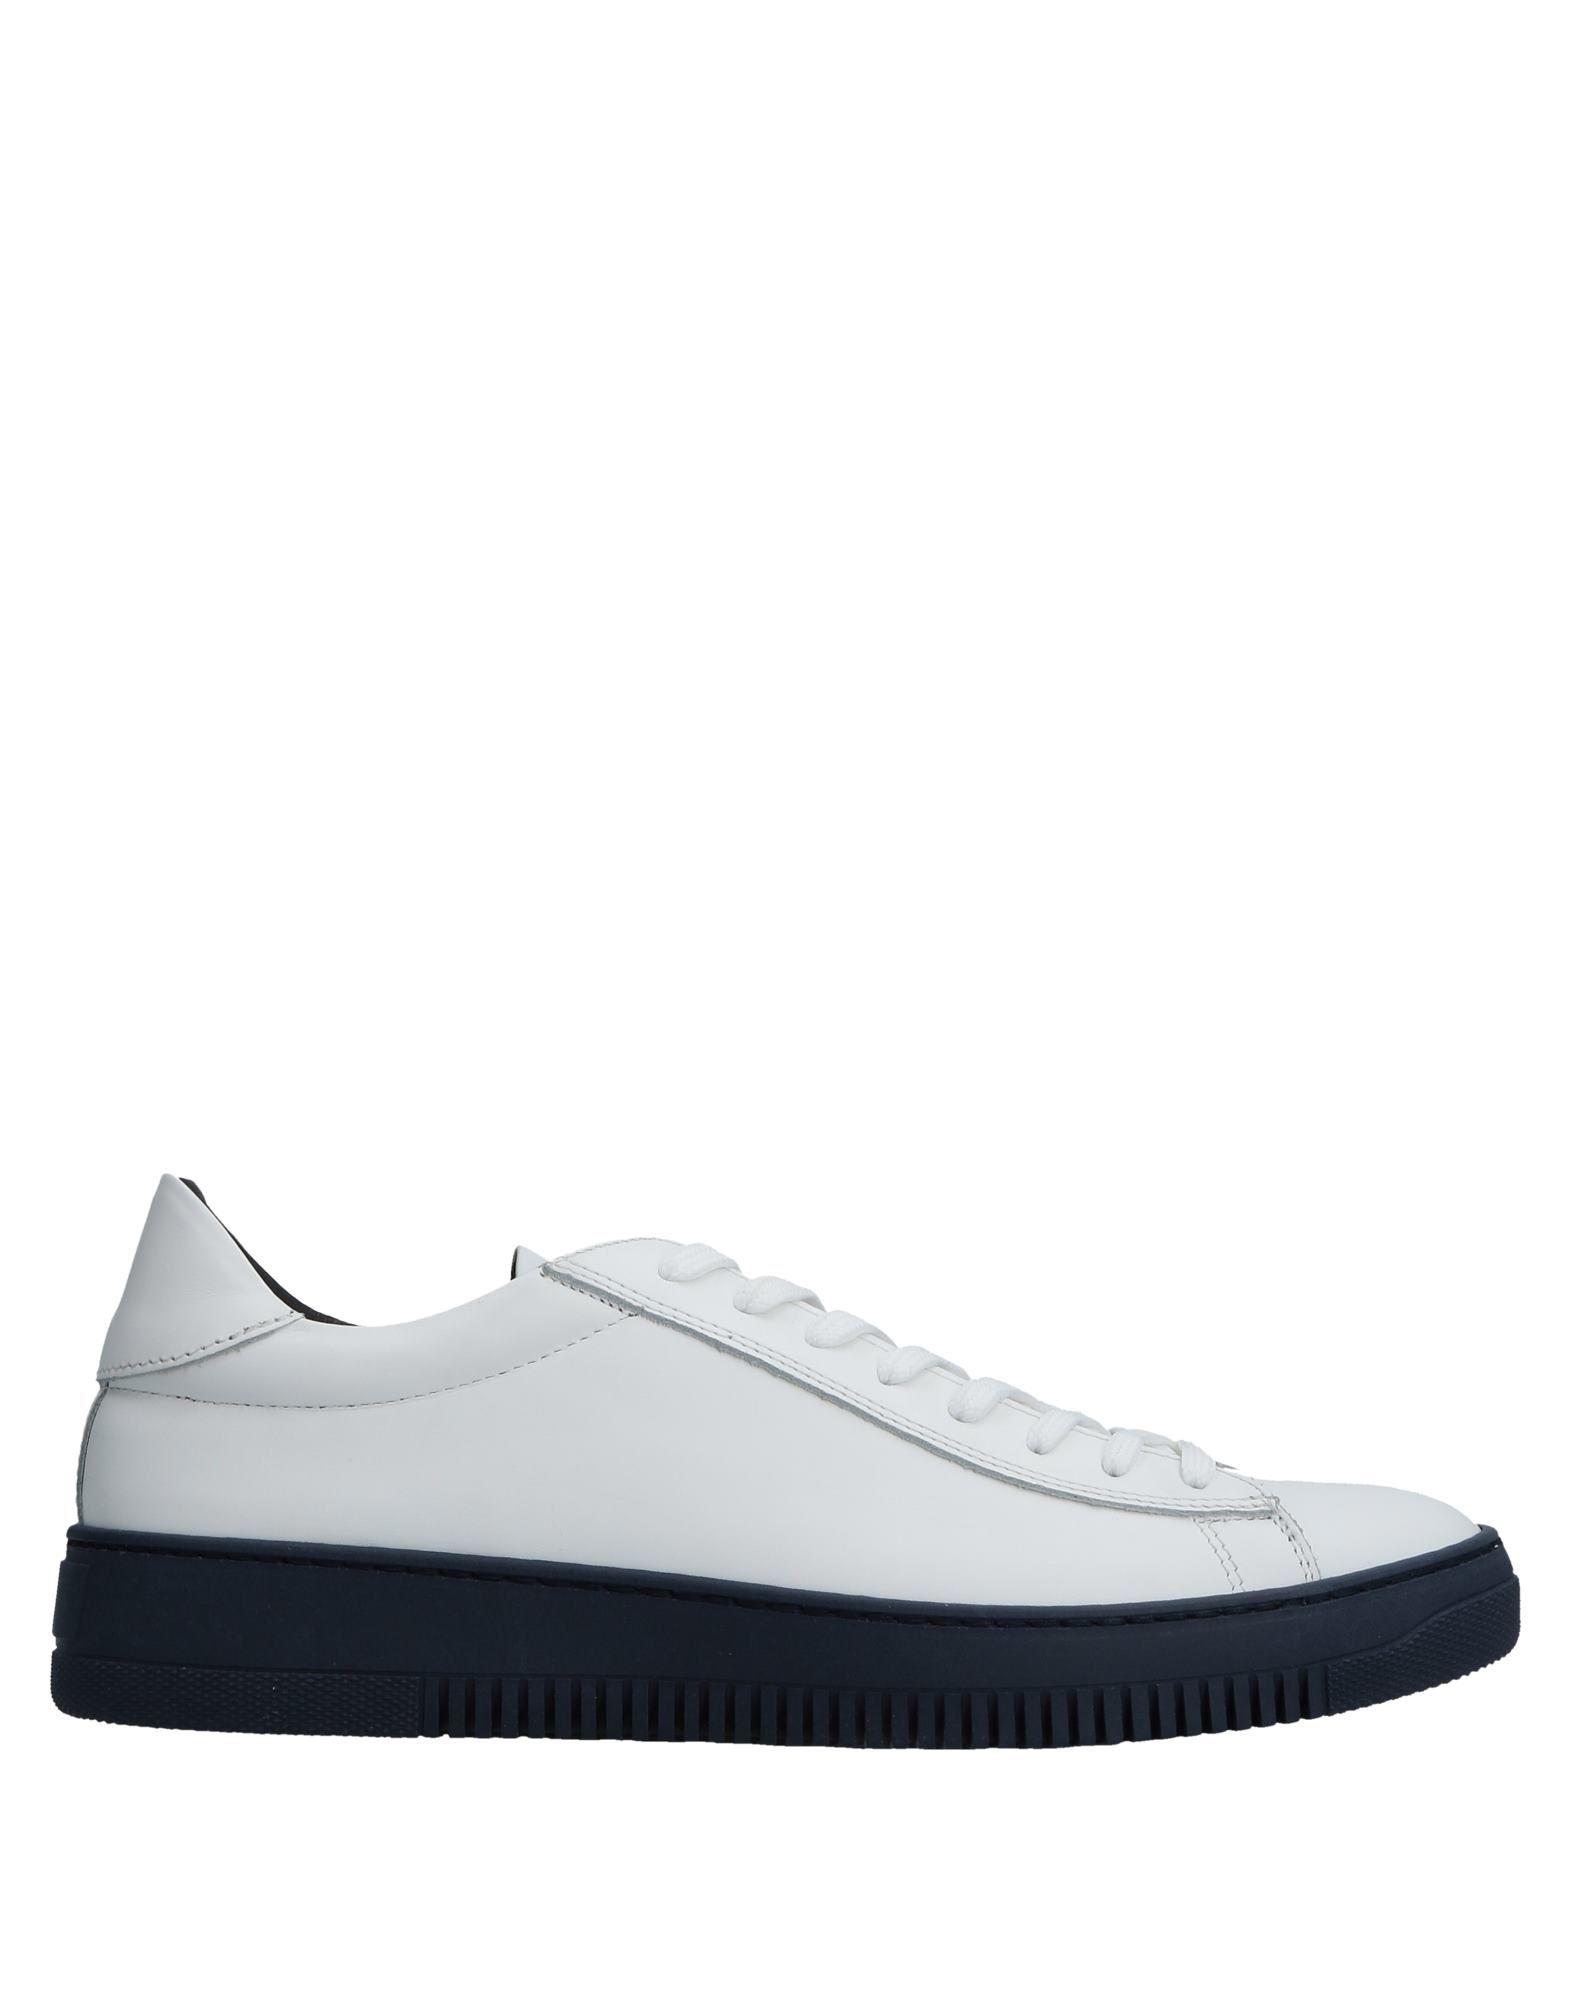 Sneakers Bagatt Uomo - 11524765VG elegante